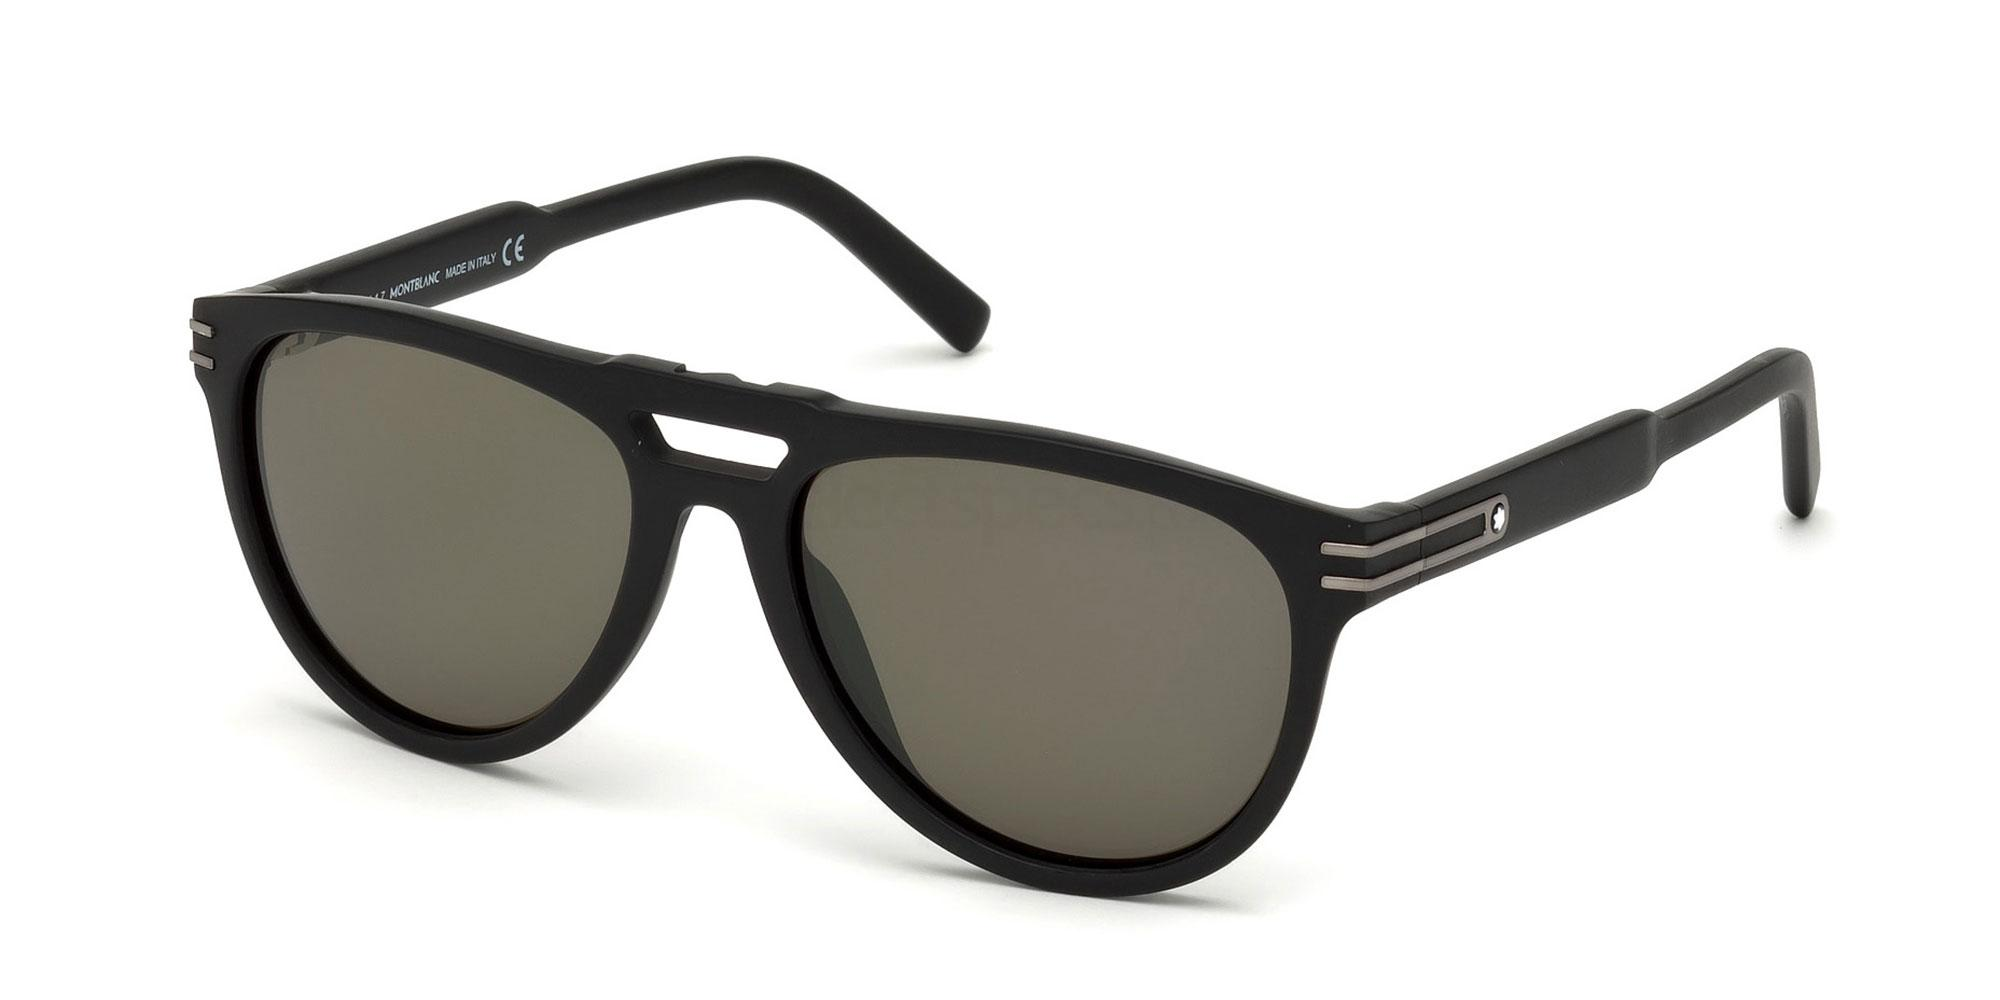 02N MB699S Sunglasses, Mont Blanc